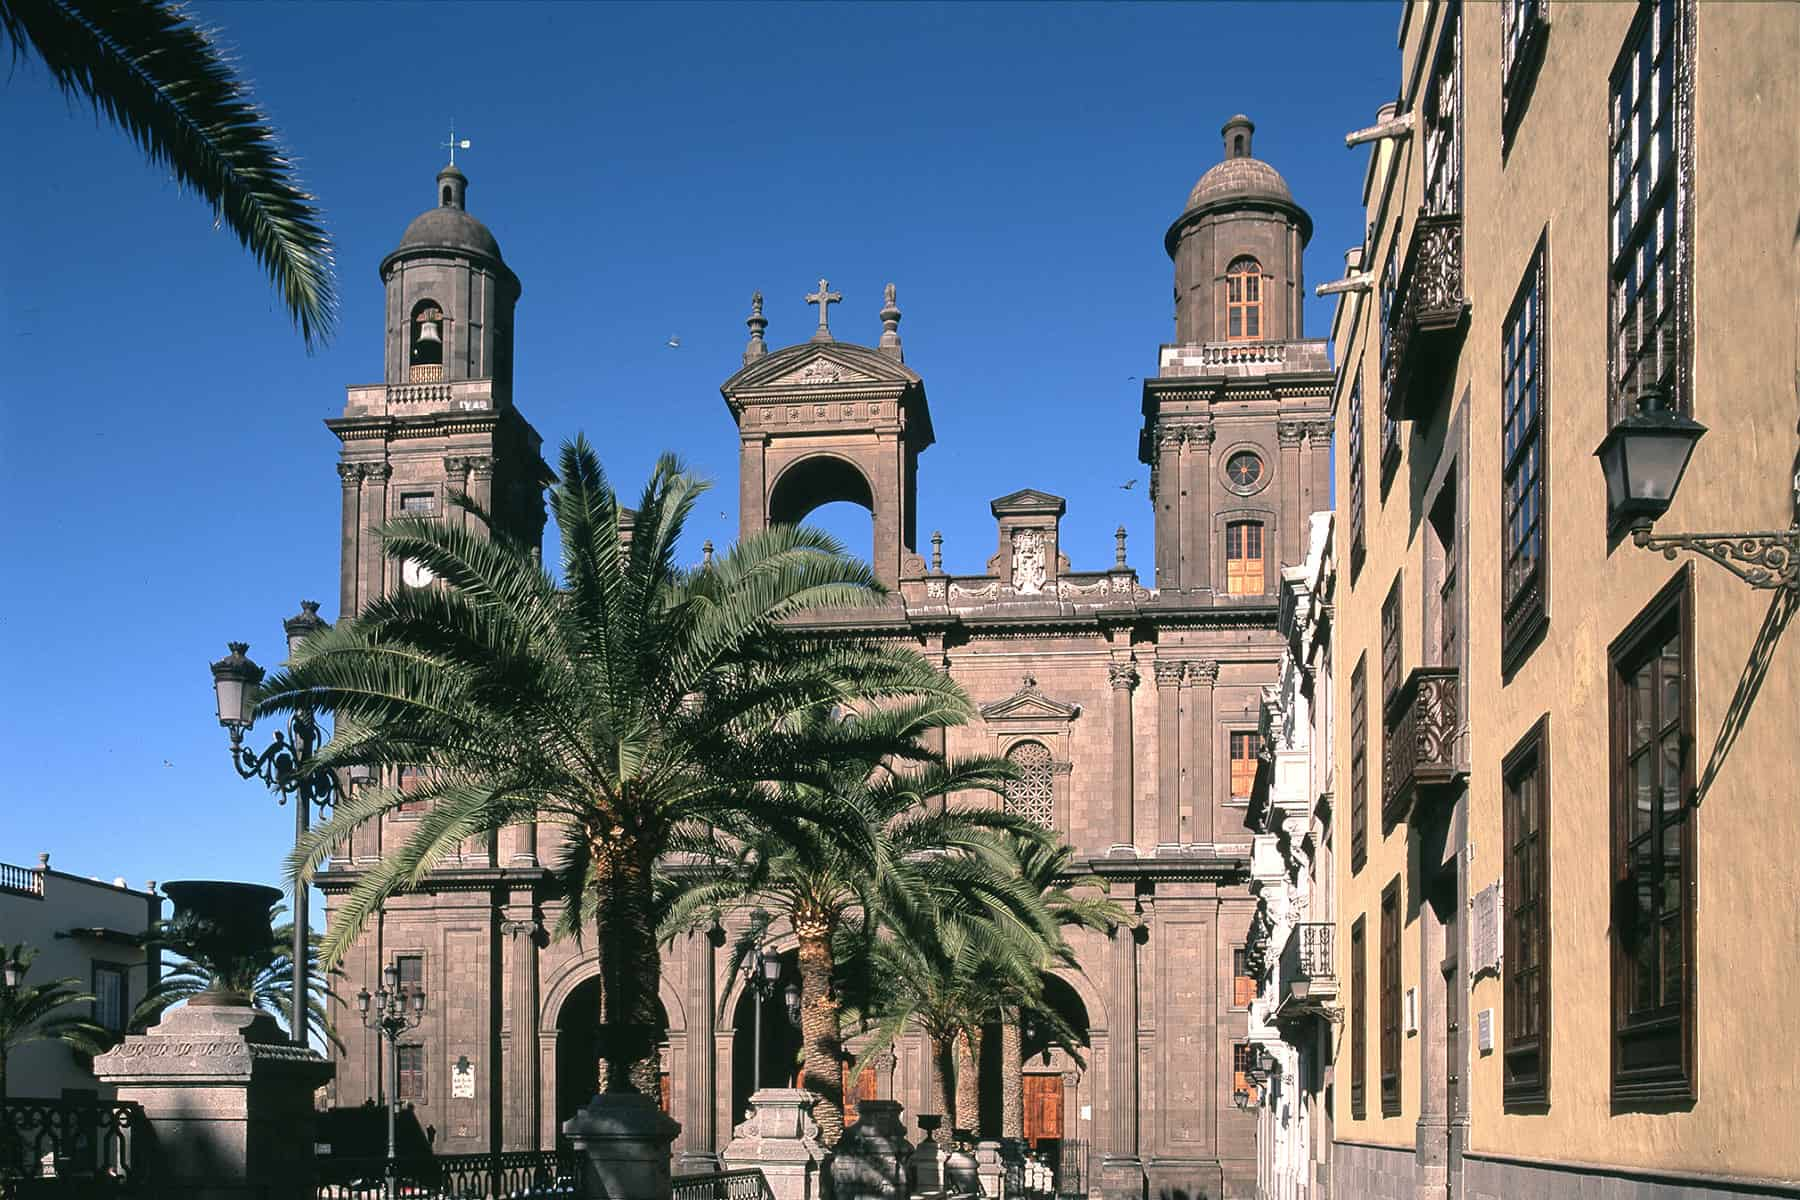 Catedral_Las_Palmas_Gran_Canaria_Nygren_lind